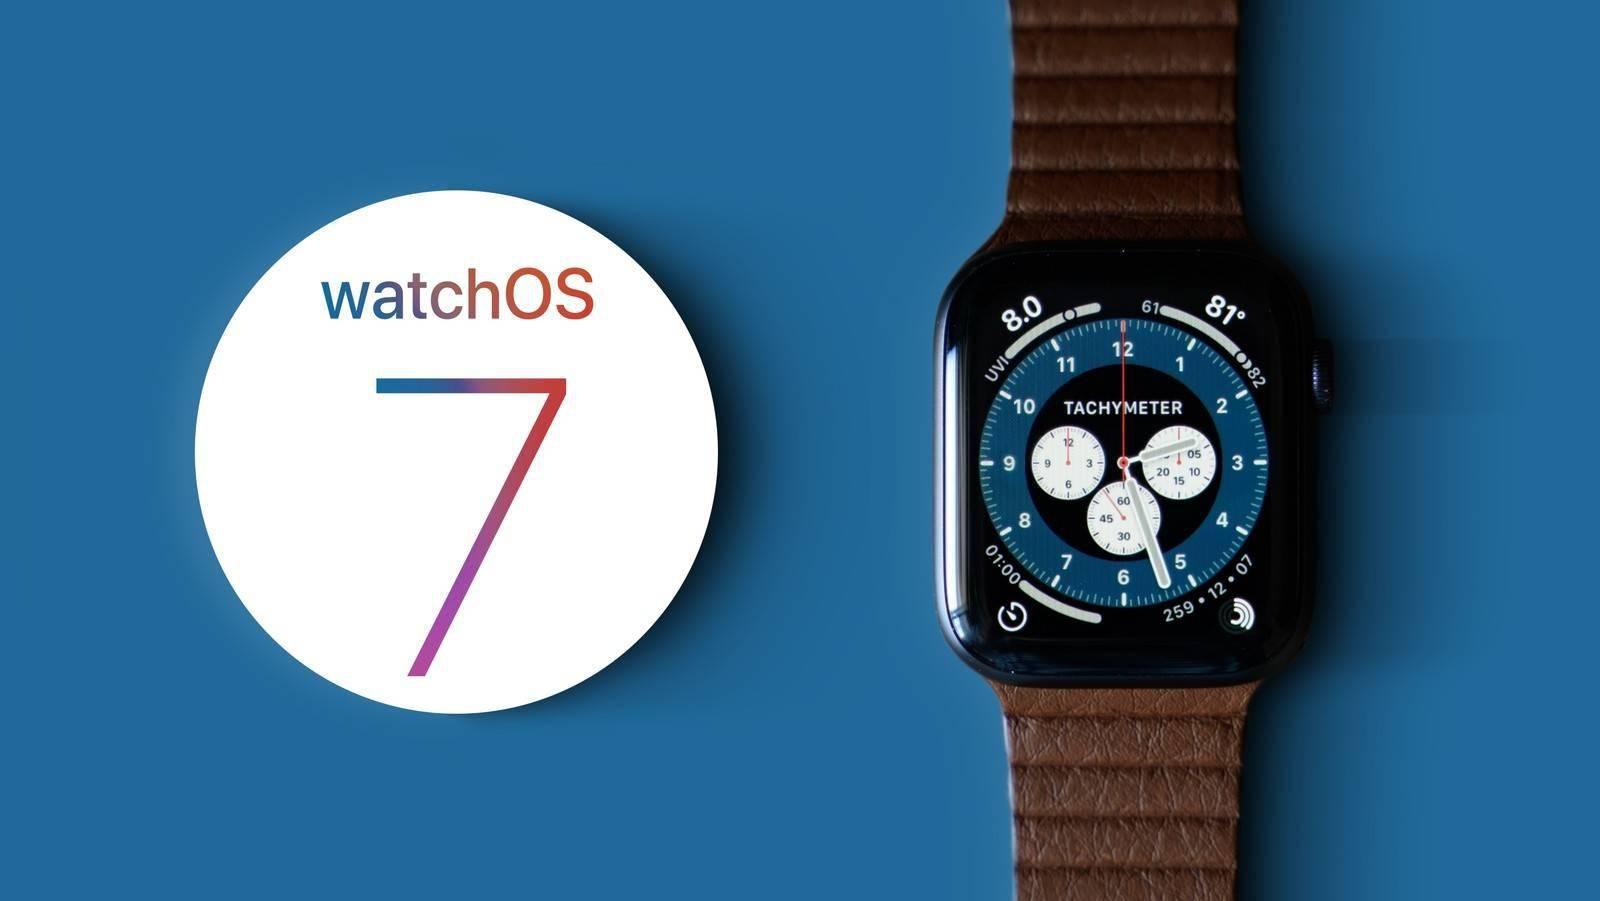 苹果在watchOS 7中已将Force Touch功能完全移除